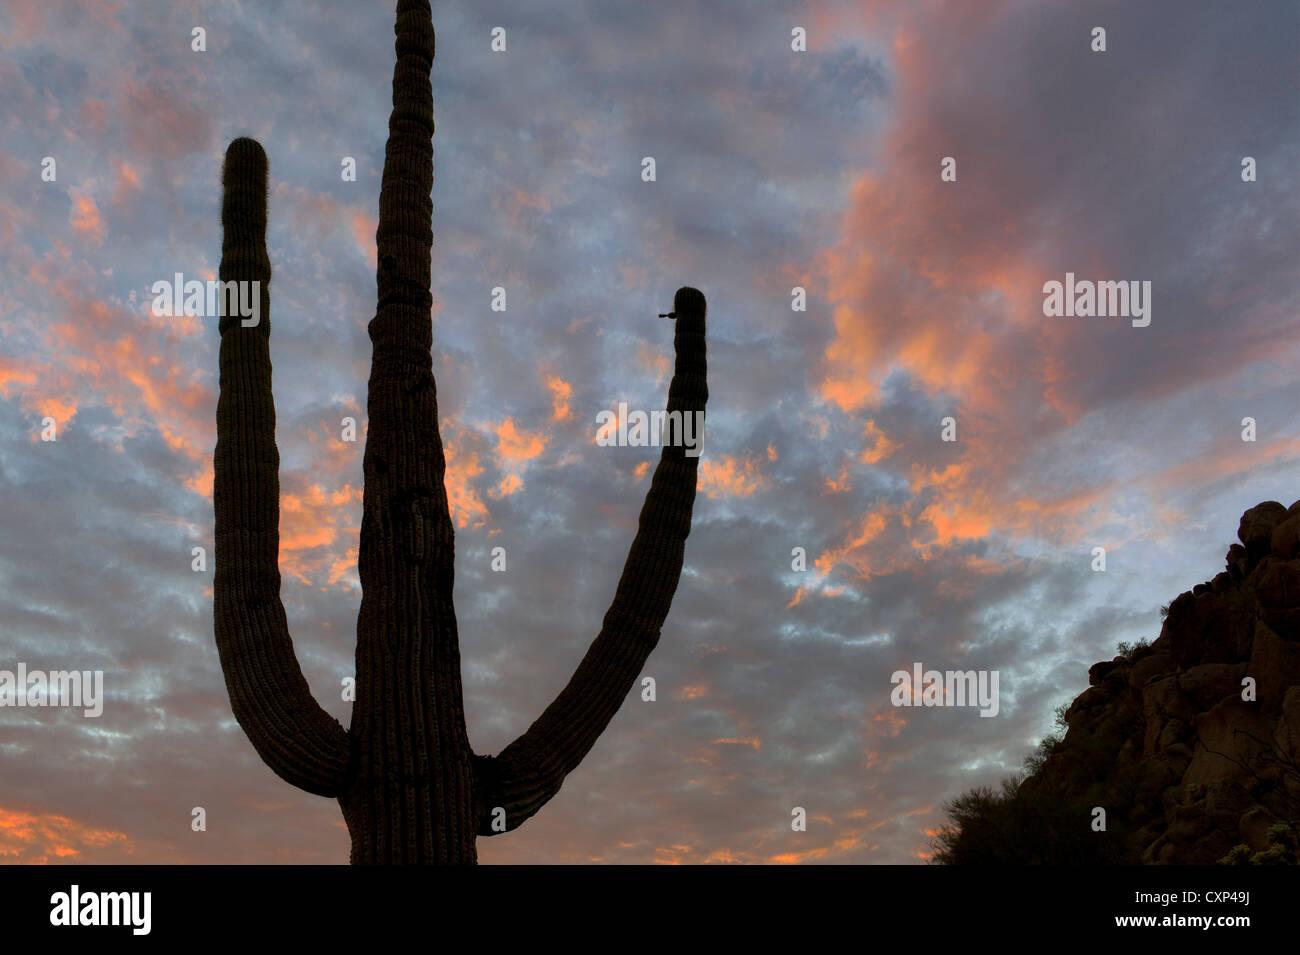 Saguaro cactus and sunset clouds. Sonoran Desert, Arizona - Stock Image